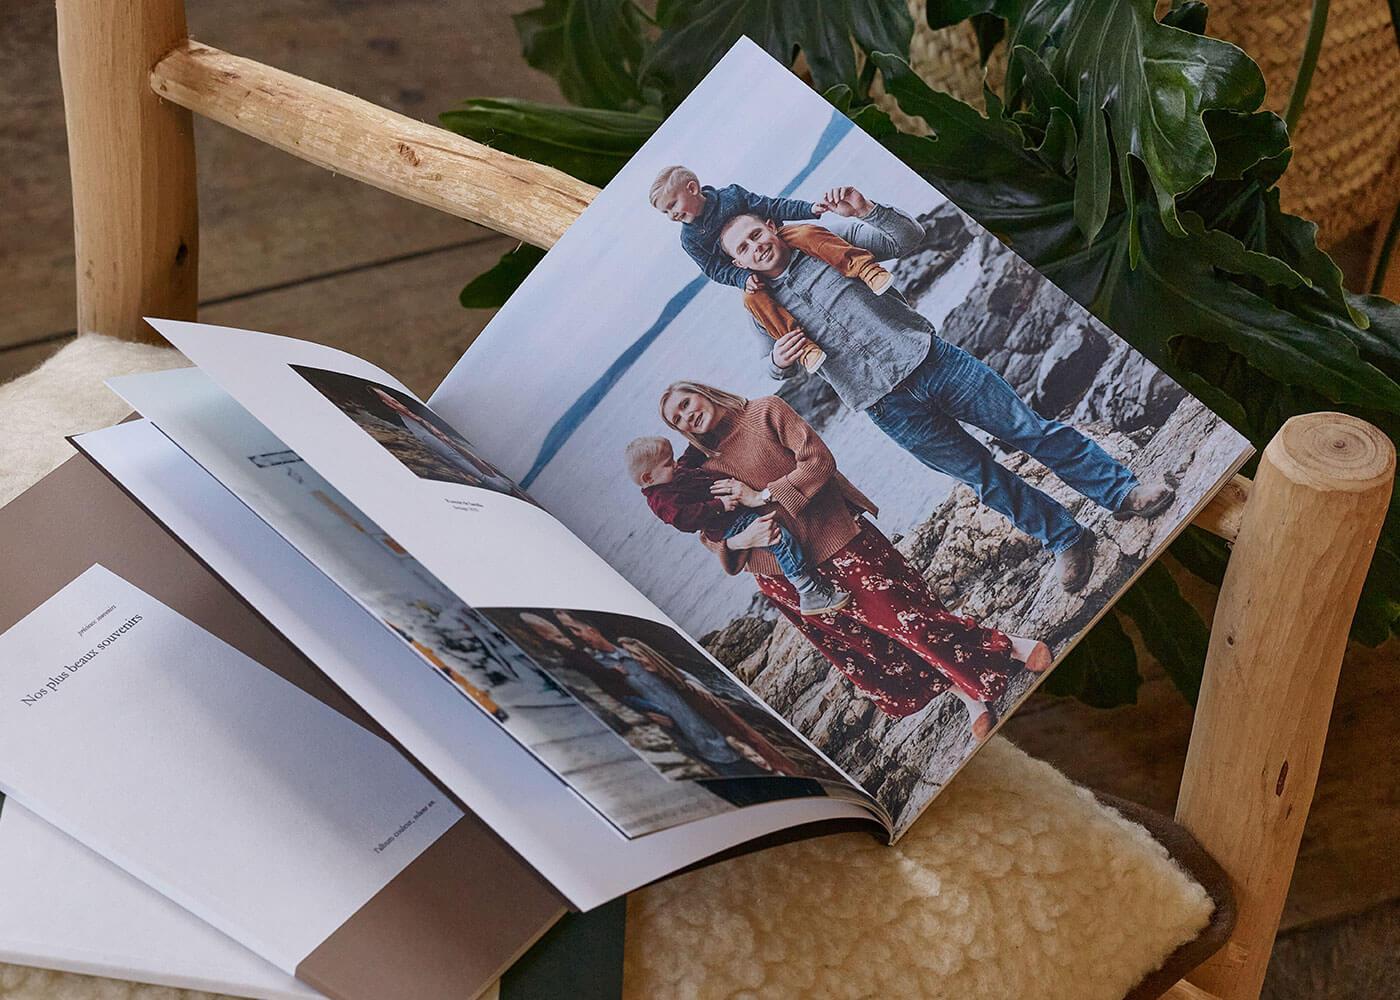 Innocence - Souvenirs - Impression album photo -  Livre photo - Grand format - Famille